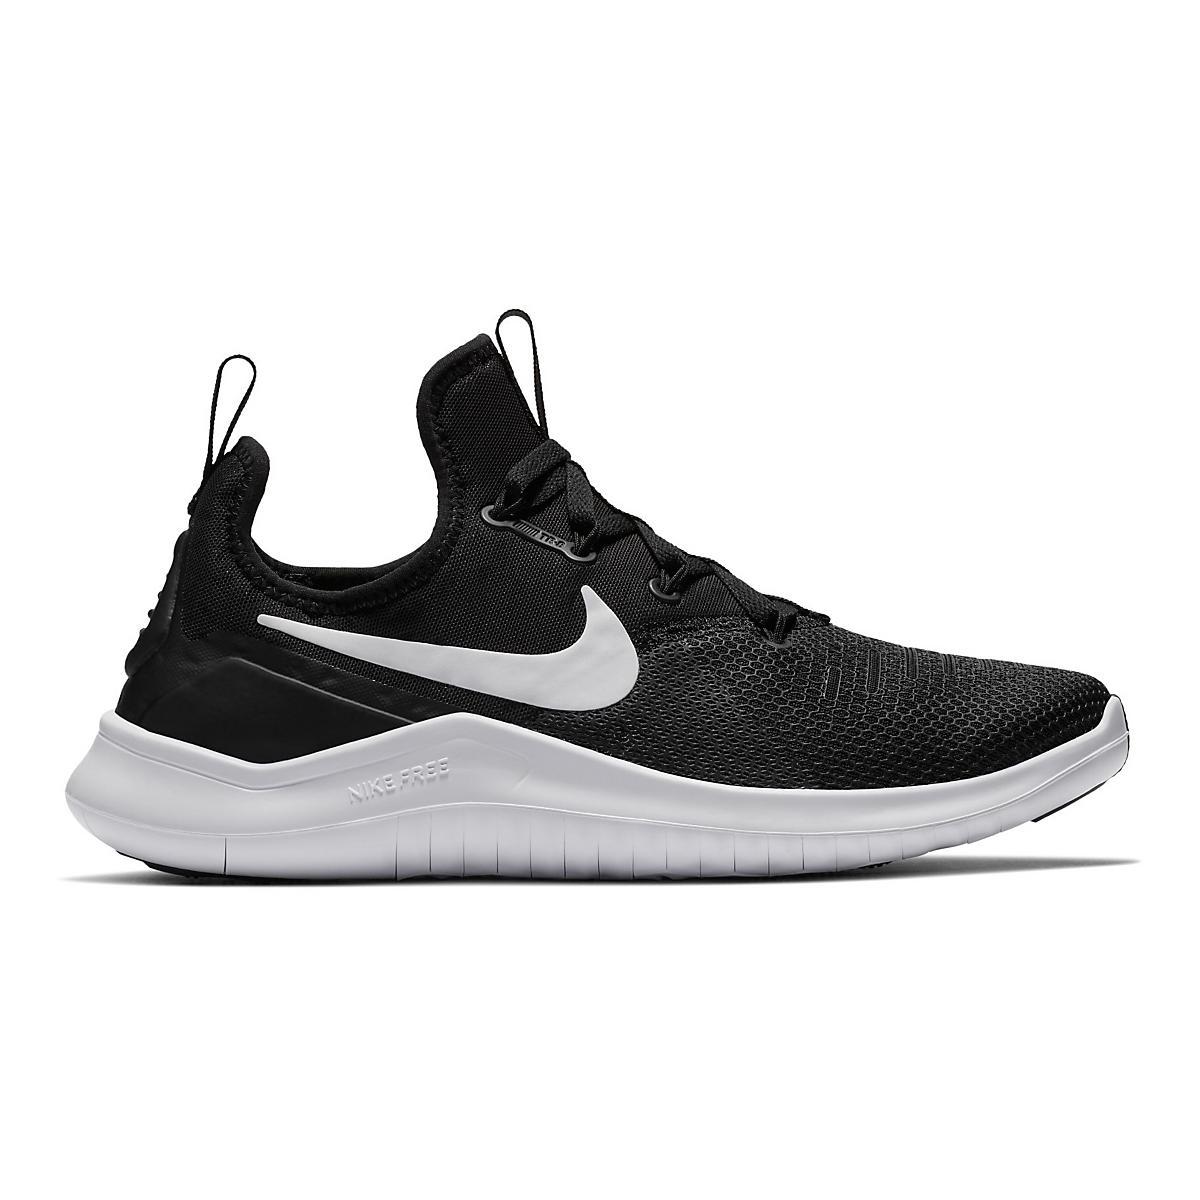 82a266954e62e Womens Nike Free TR 8 Cross Training Shoe at Road Runner Sports